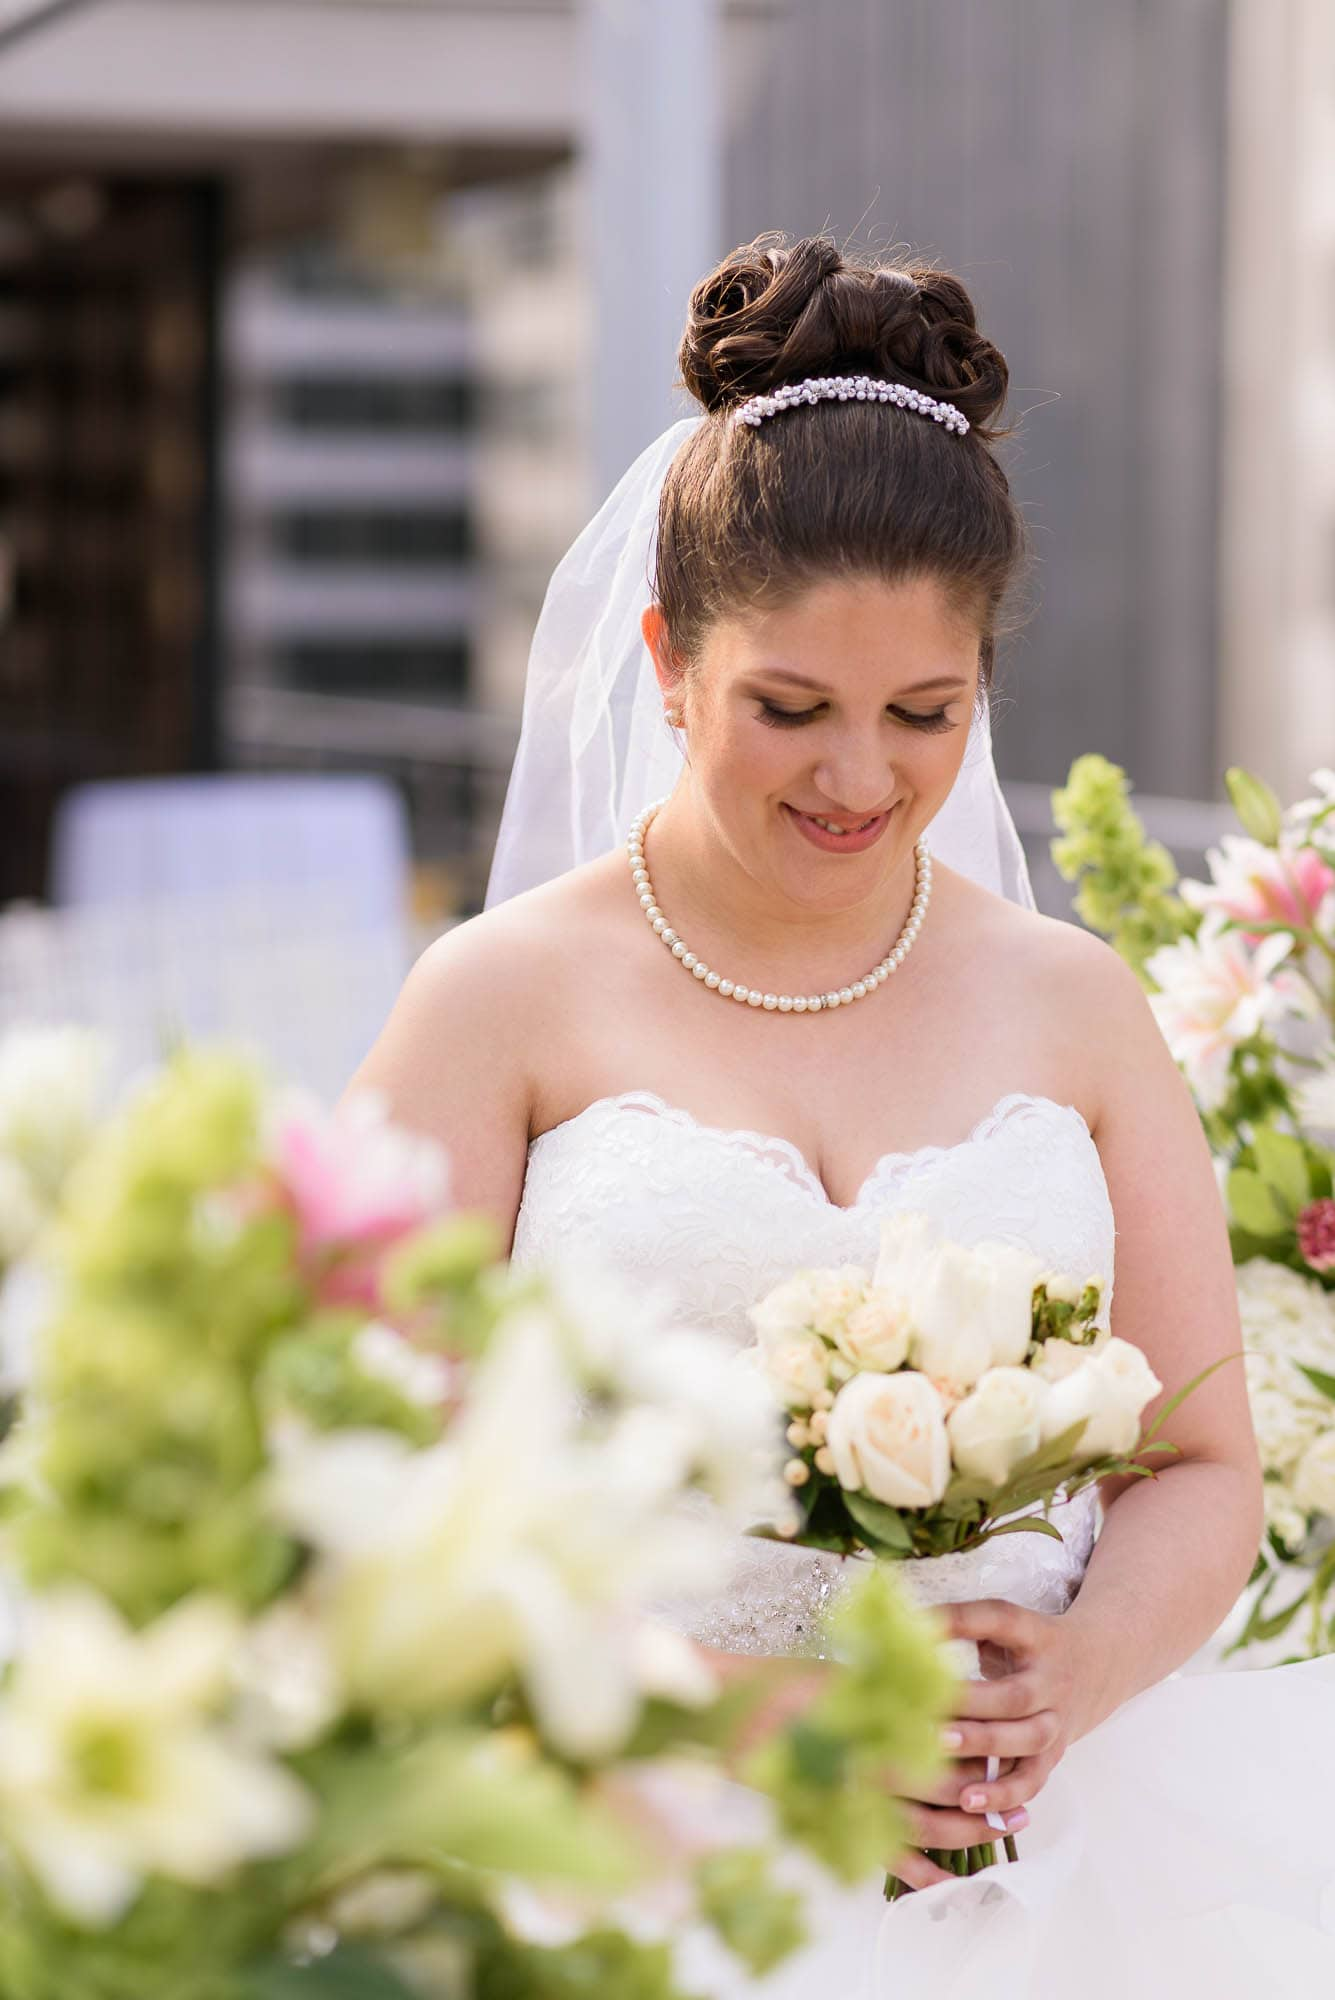 014_Alan_and_Heidi_Wedding_Nicole_Roman